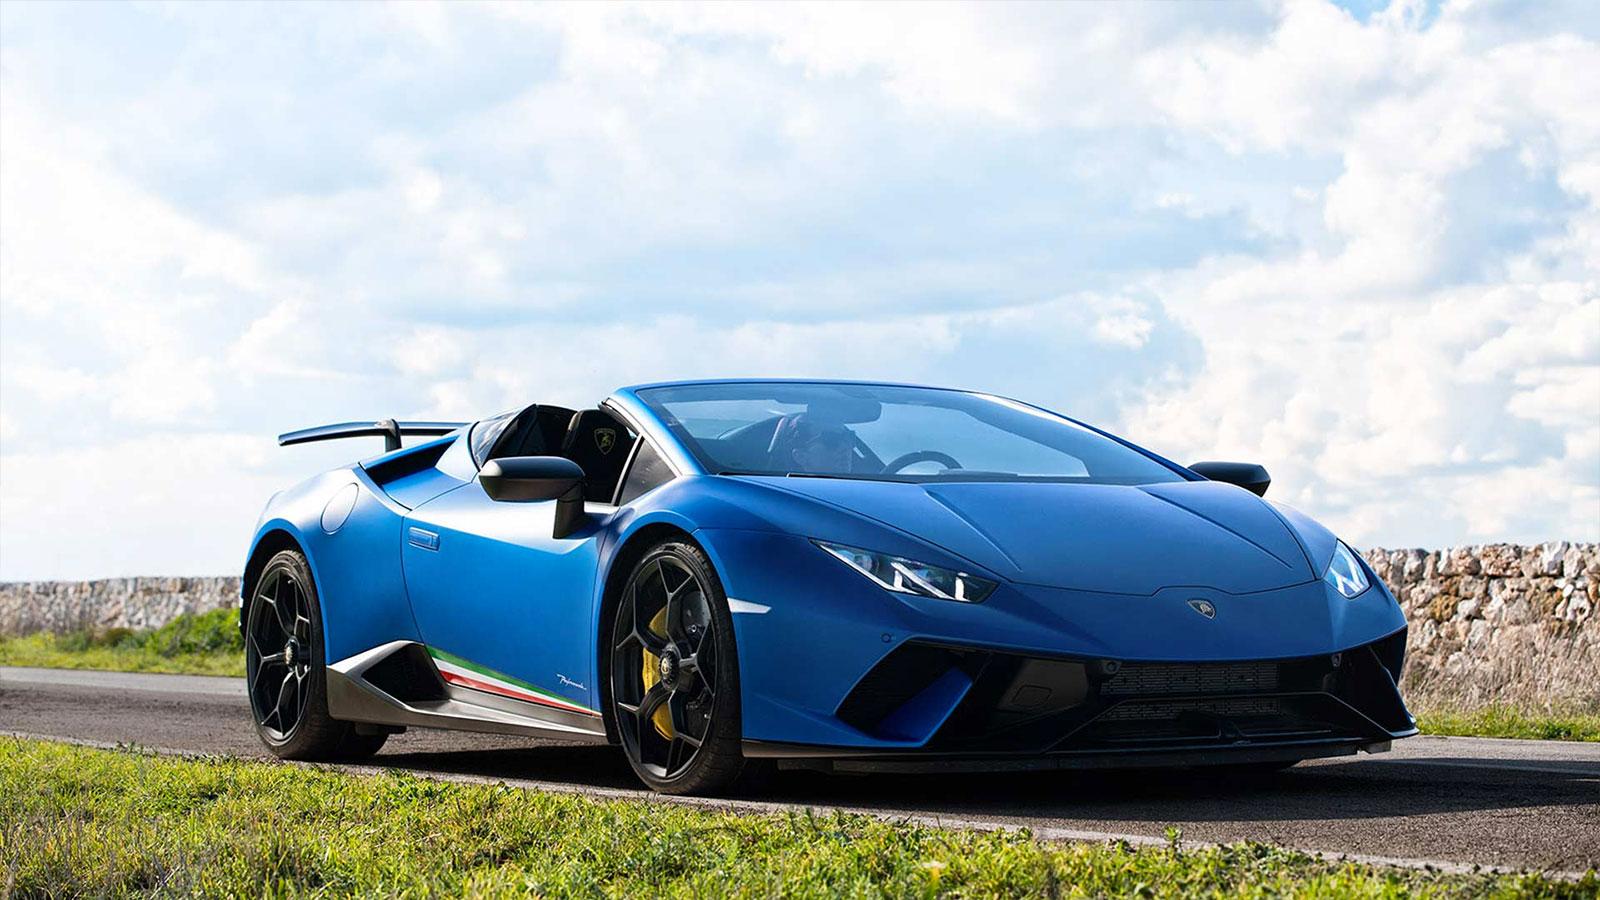 Lamborghini Huracan Performante Spyder - Vivid Technology image 7